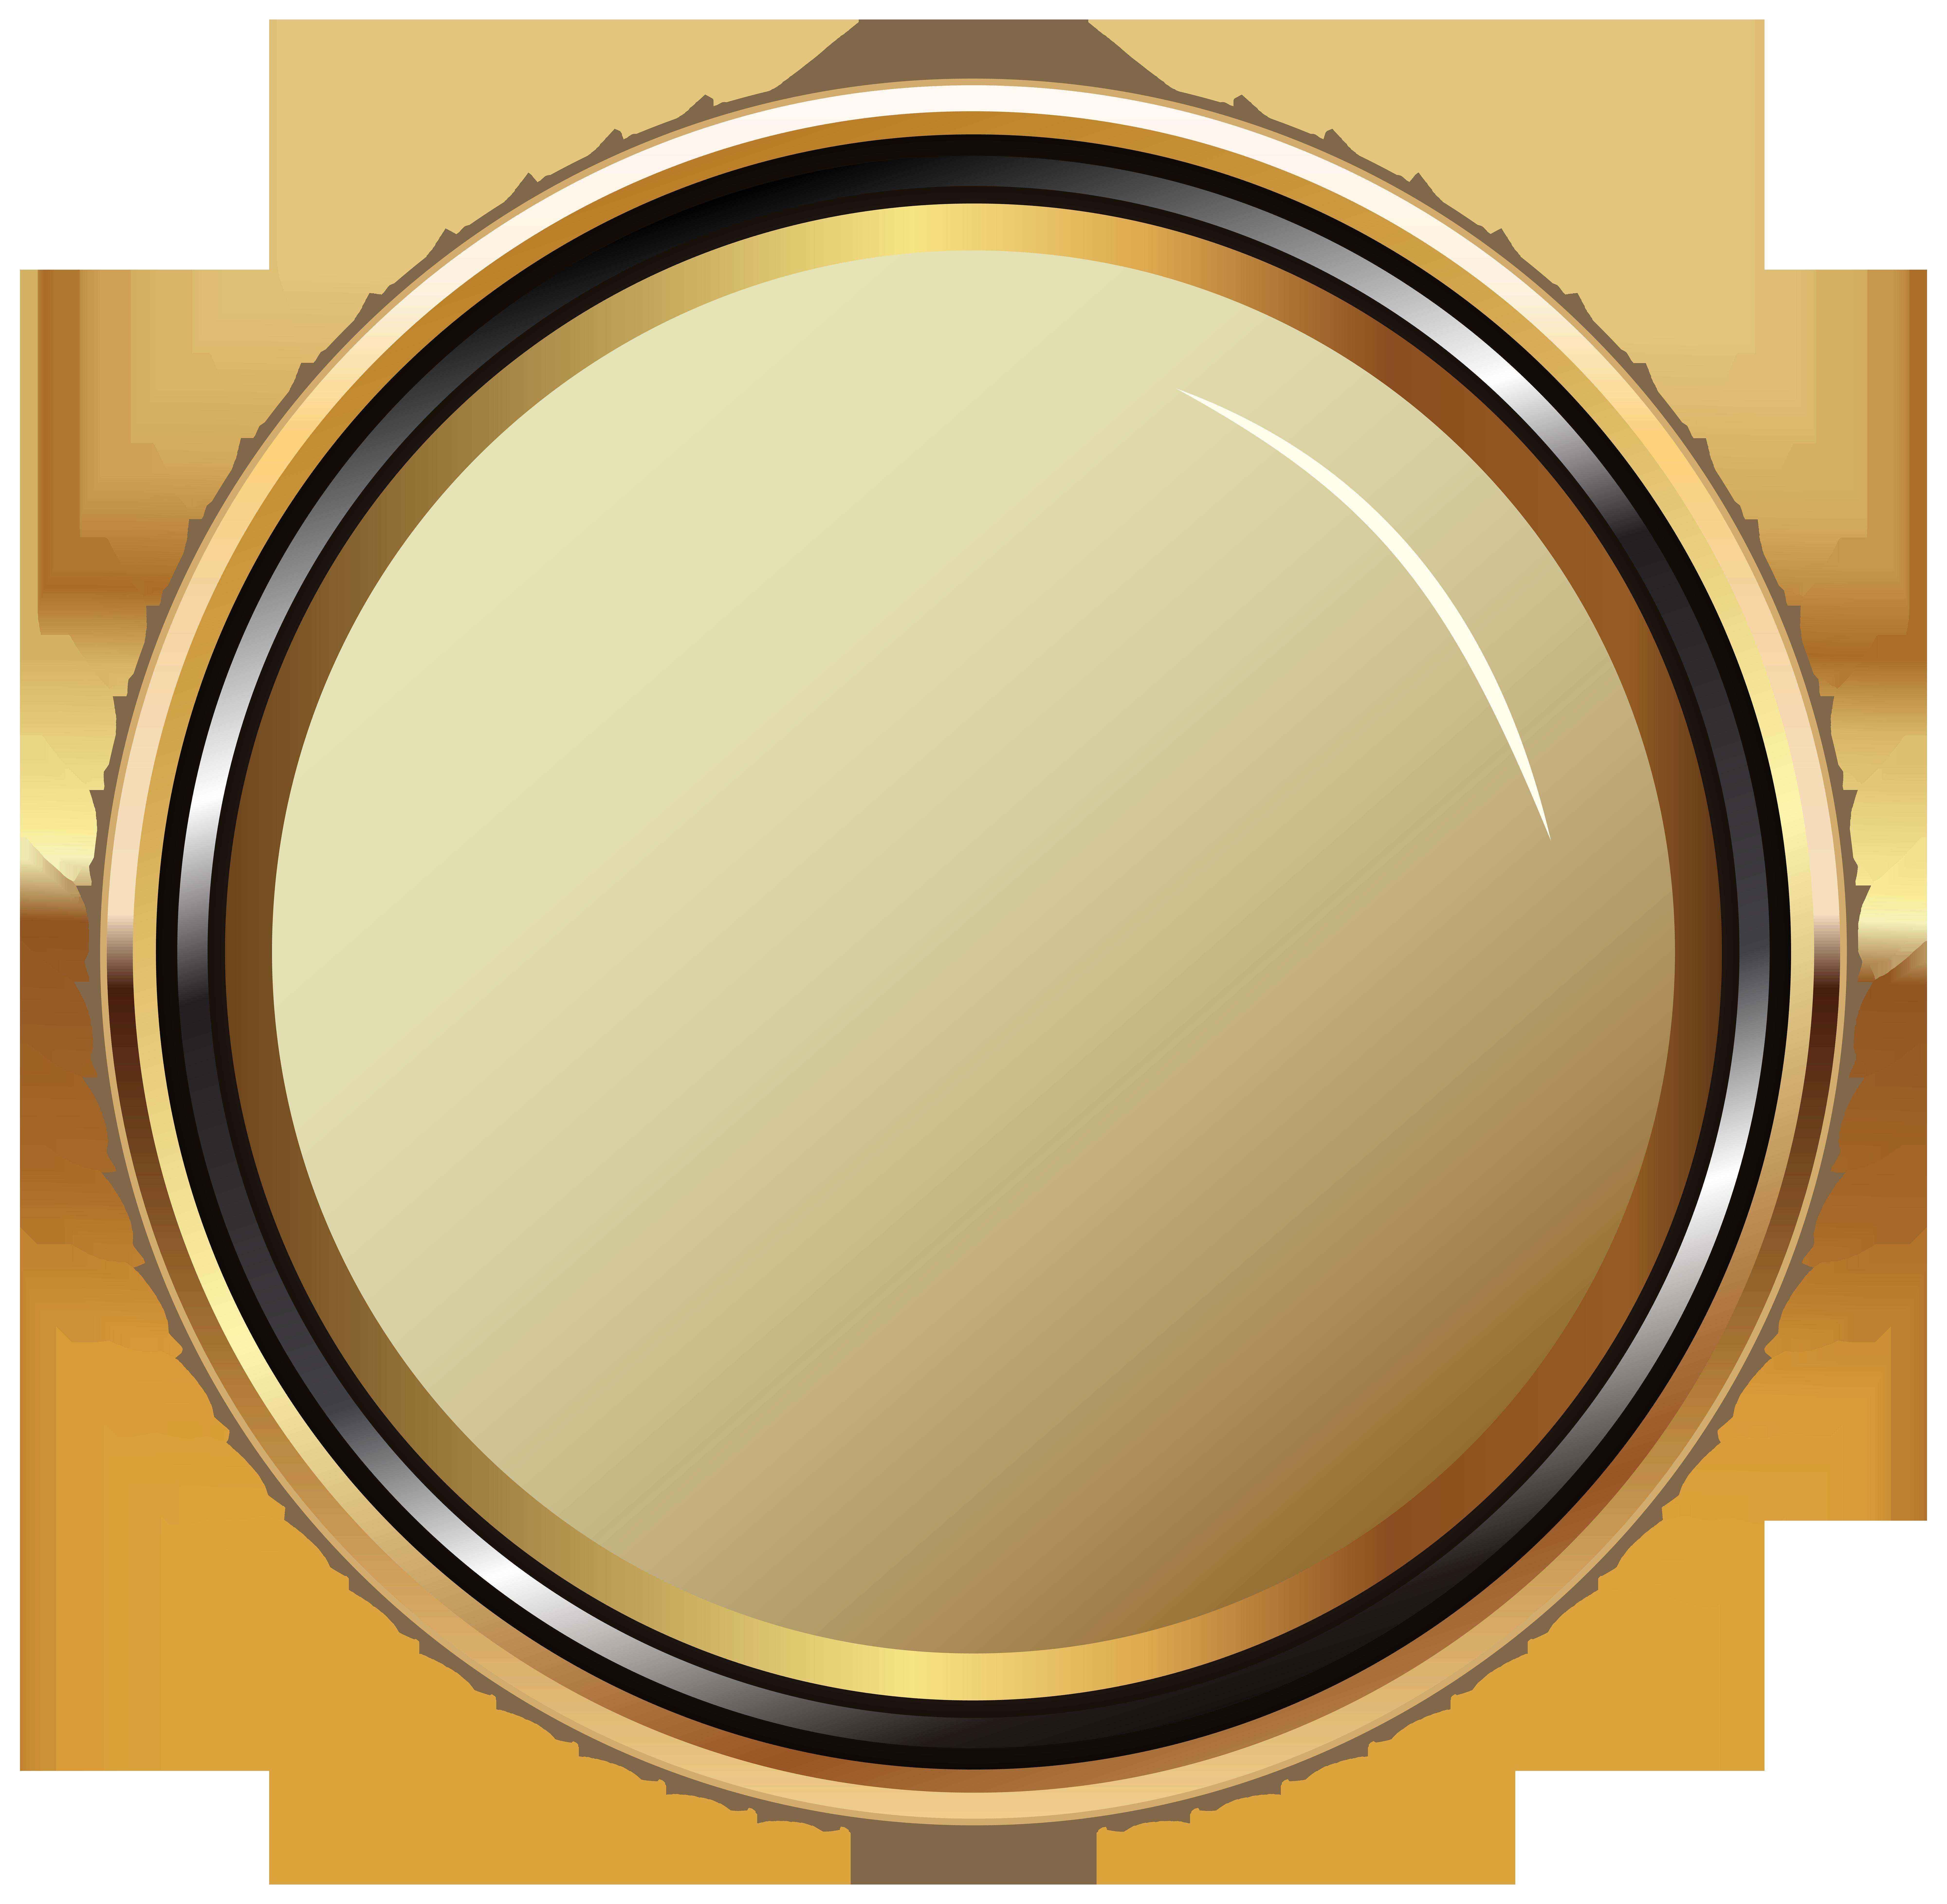 Oval Badge Transparent Gold Png Free Photo Clip Art Digital Graphics Art Art Images